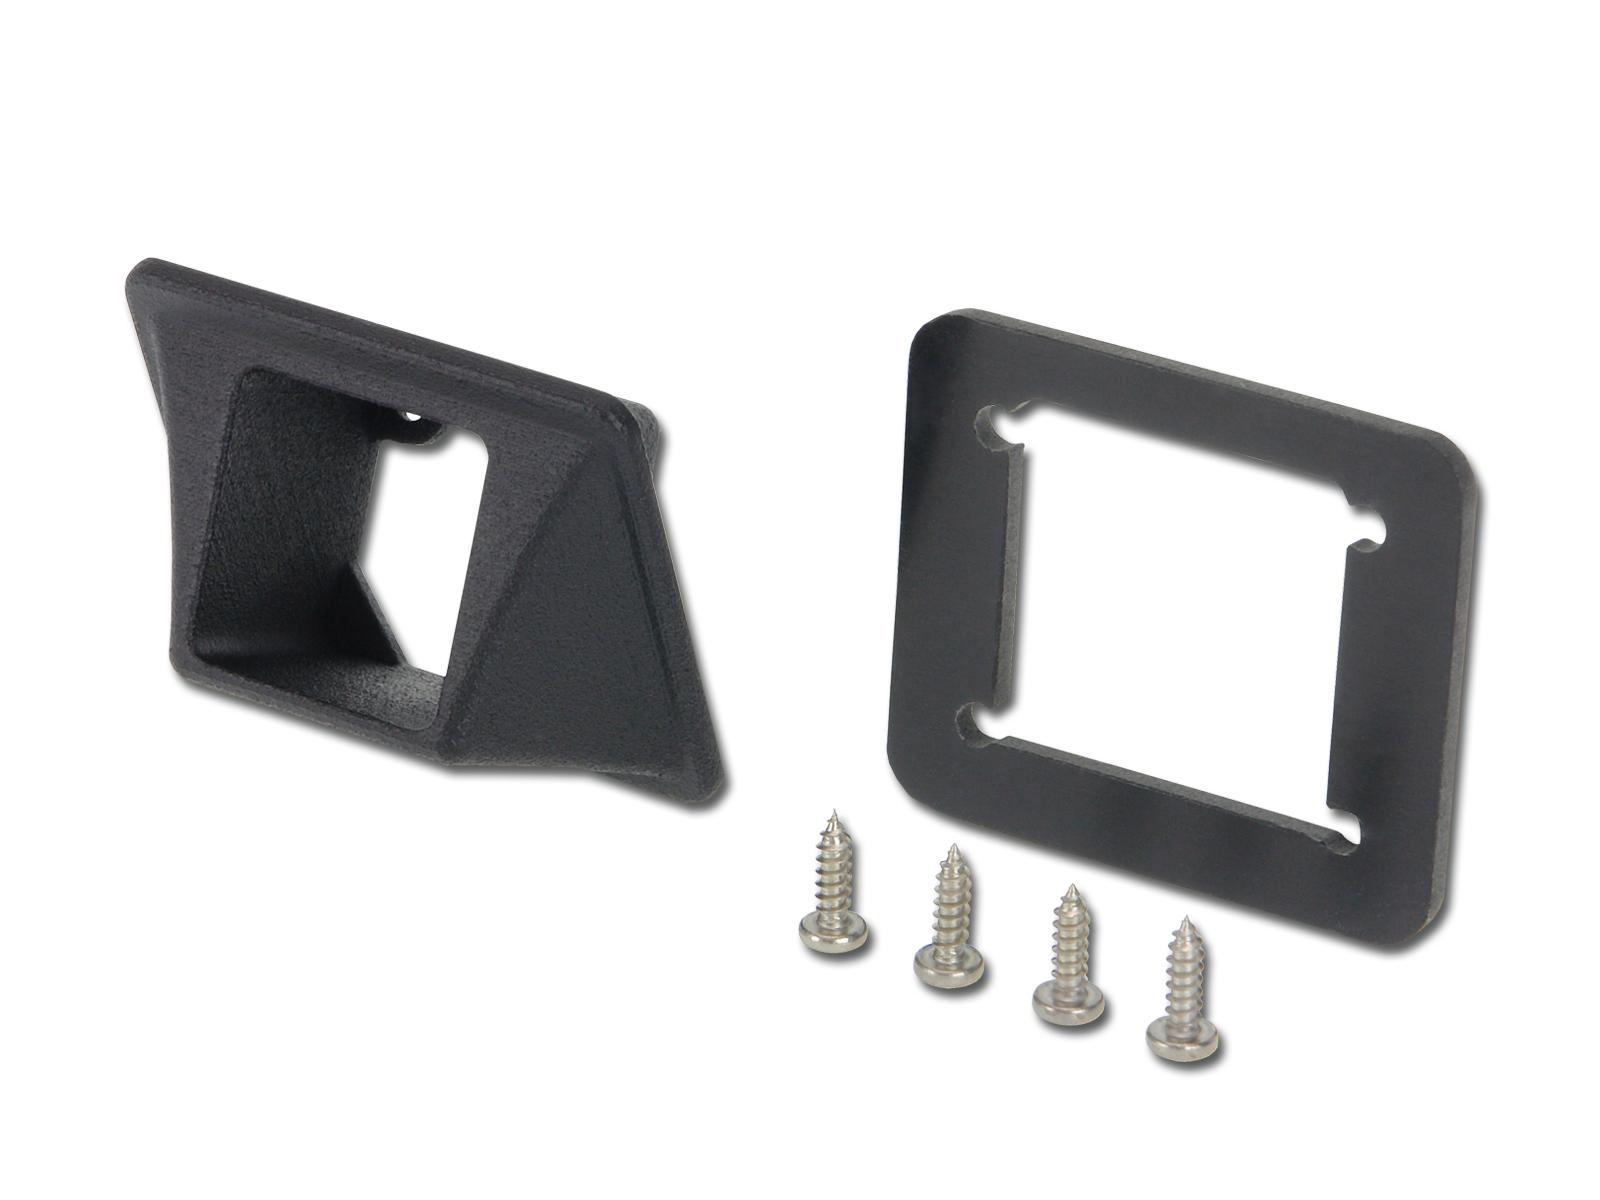 Alpine KIT-R1V447 Rückfahrkamera-Einbauset für Mercedes Vito (V447) für HCE-C252RD